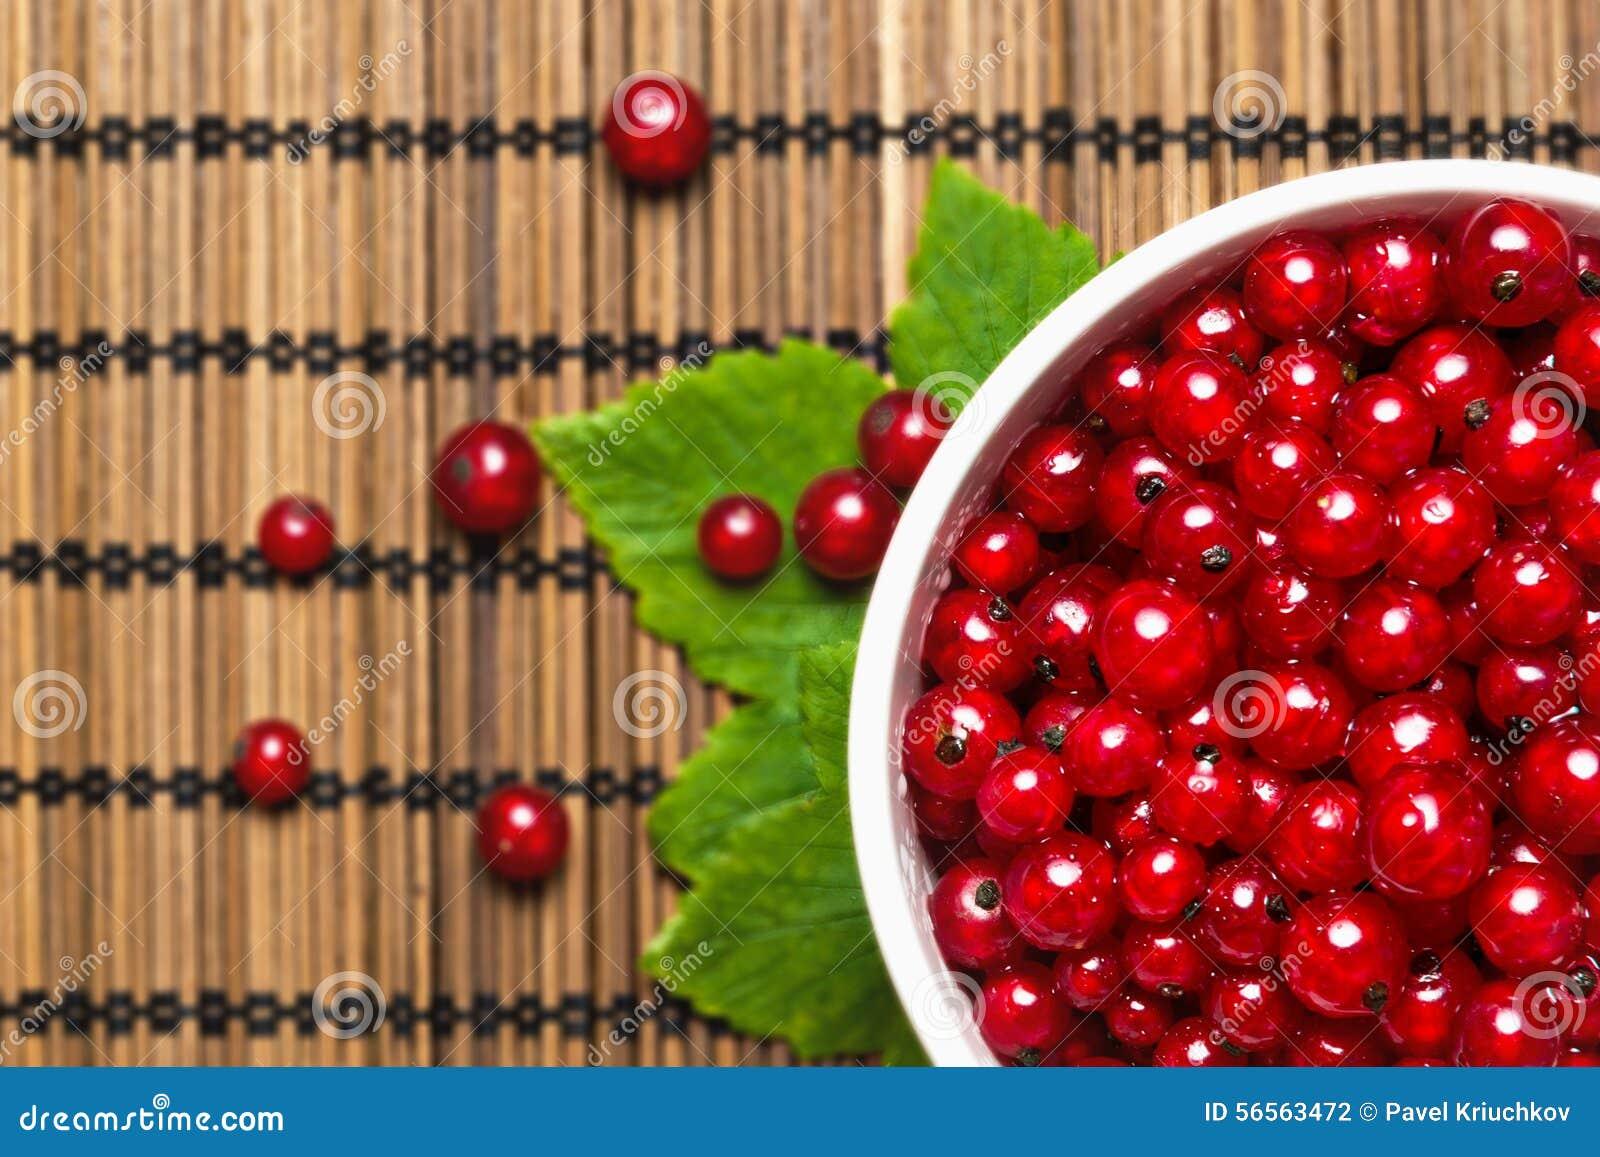 Download Φρέσκια κόκκινη σταφίδα σε έναν πίνακα Στοκ Εικόνες - εικόνα από δάσος, πίνακας: 56563472